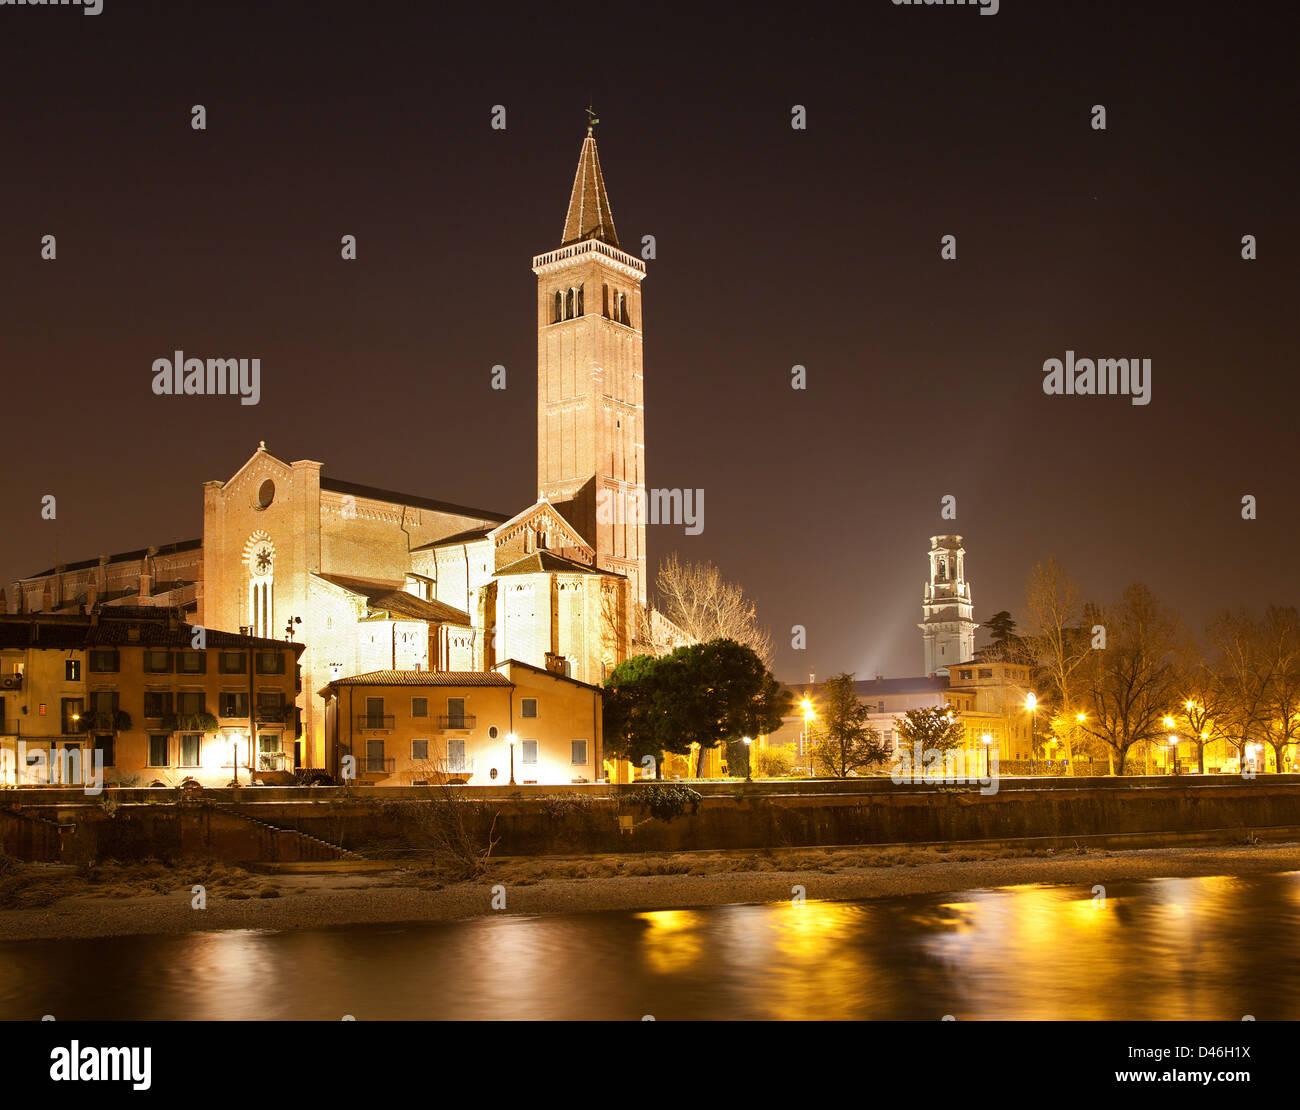 Verona - Adige river and Santa Anastasia church at night - Stock Image